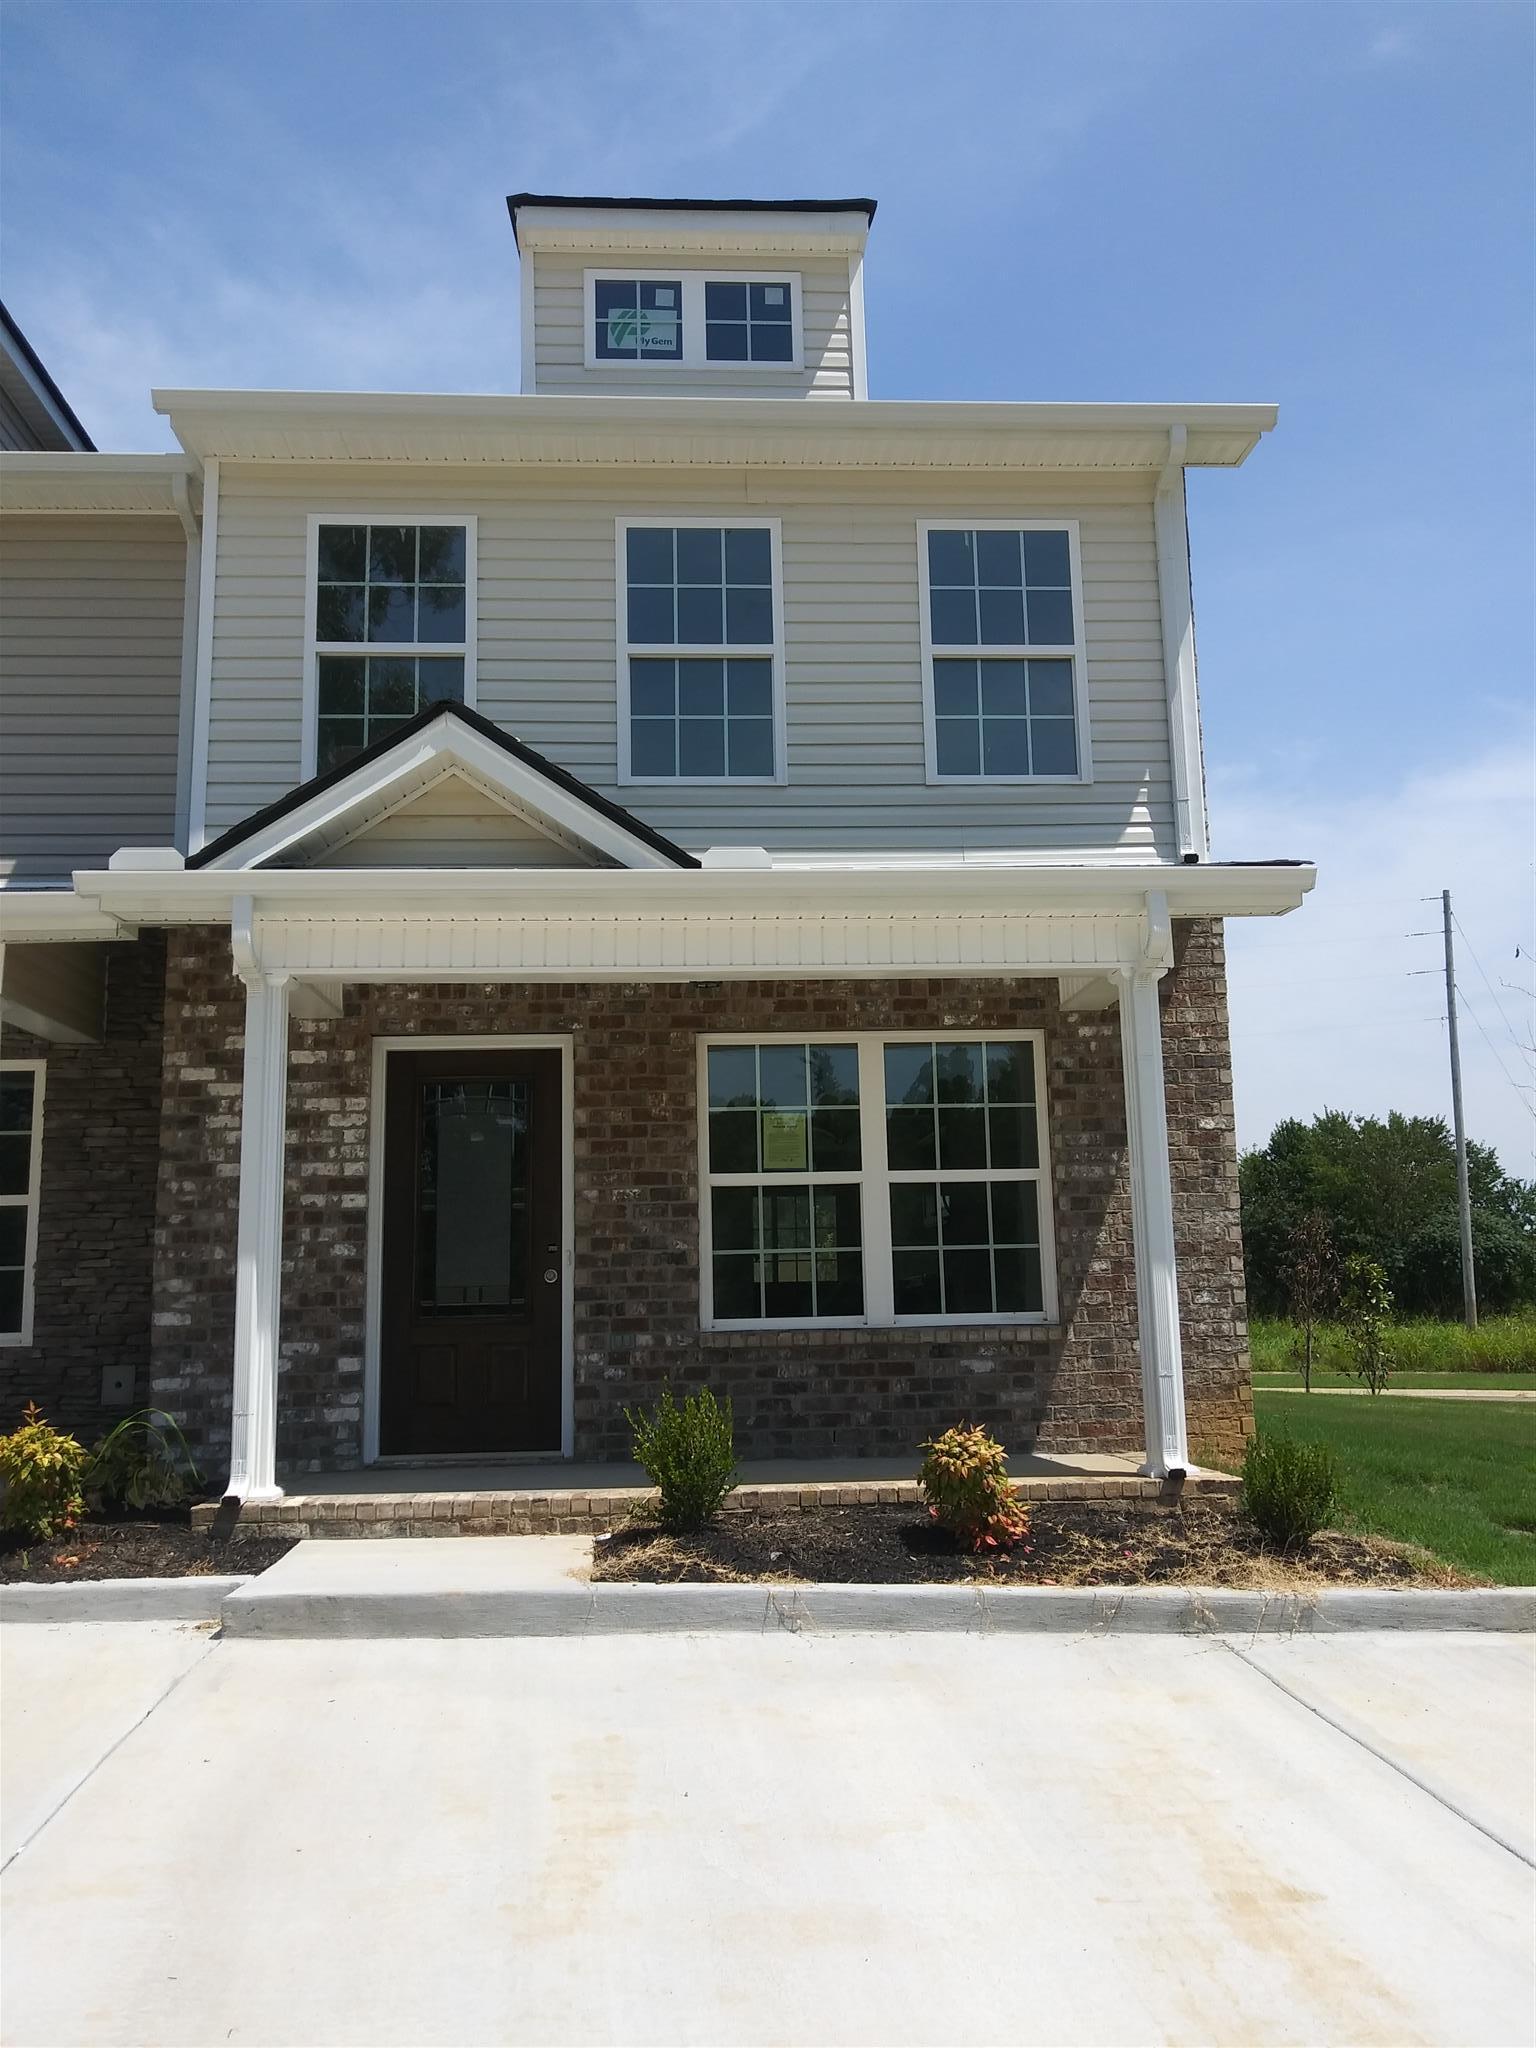 16 Lot 16 Downstream, Ashland City, TN 37015 - Ashland City, TN real estate listing